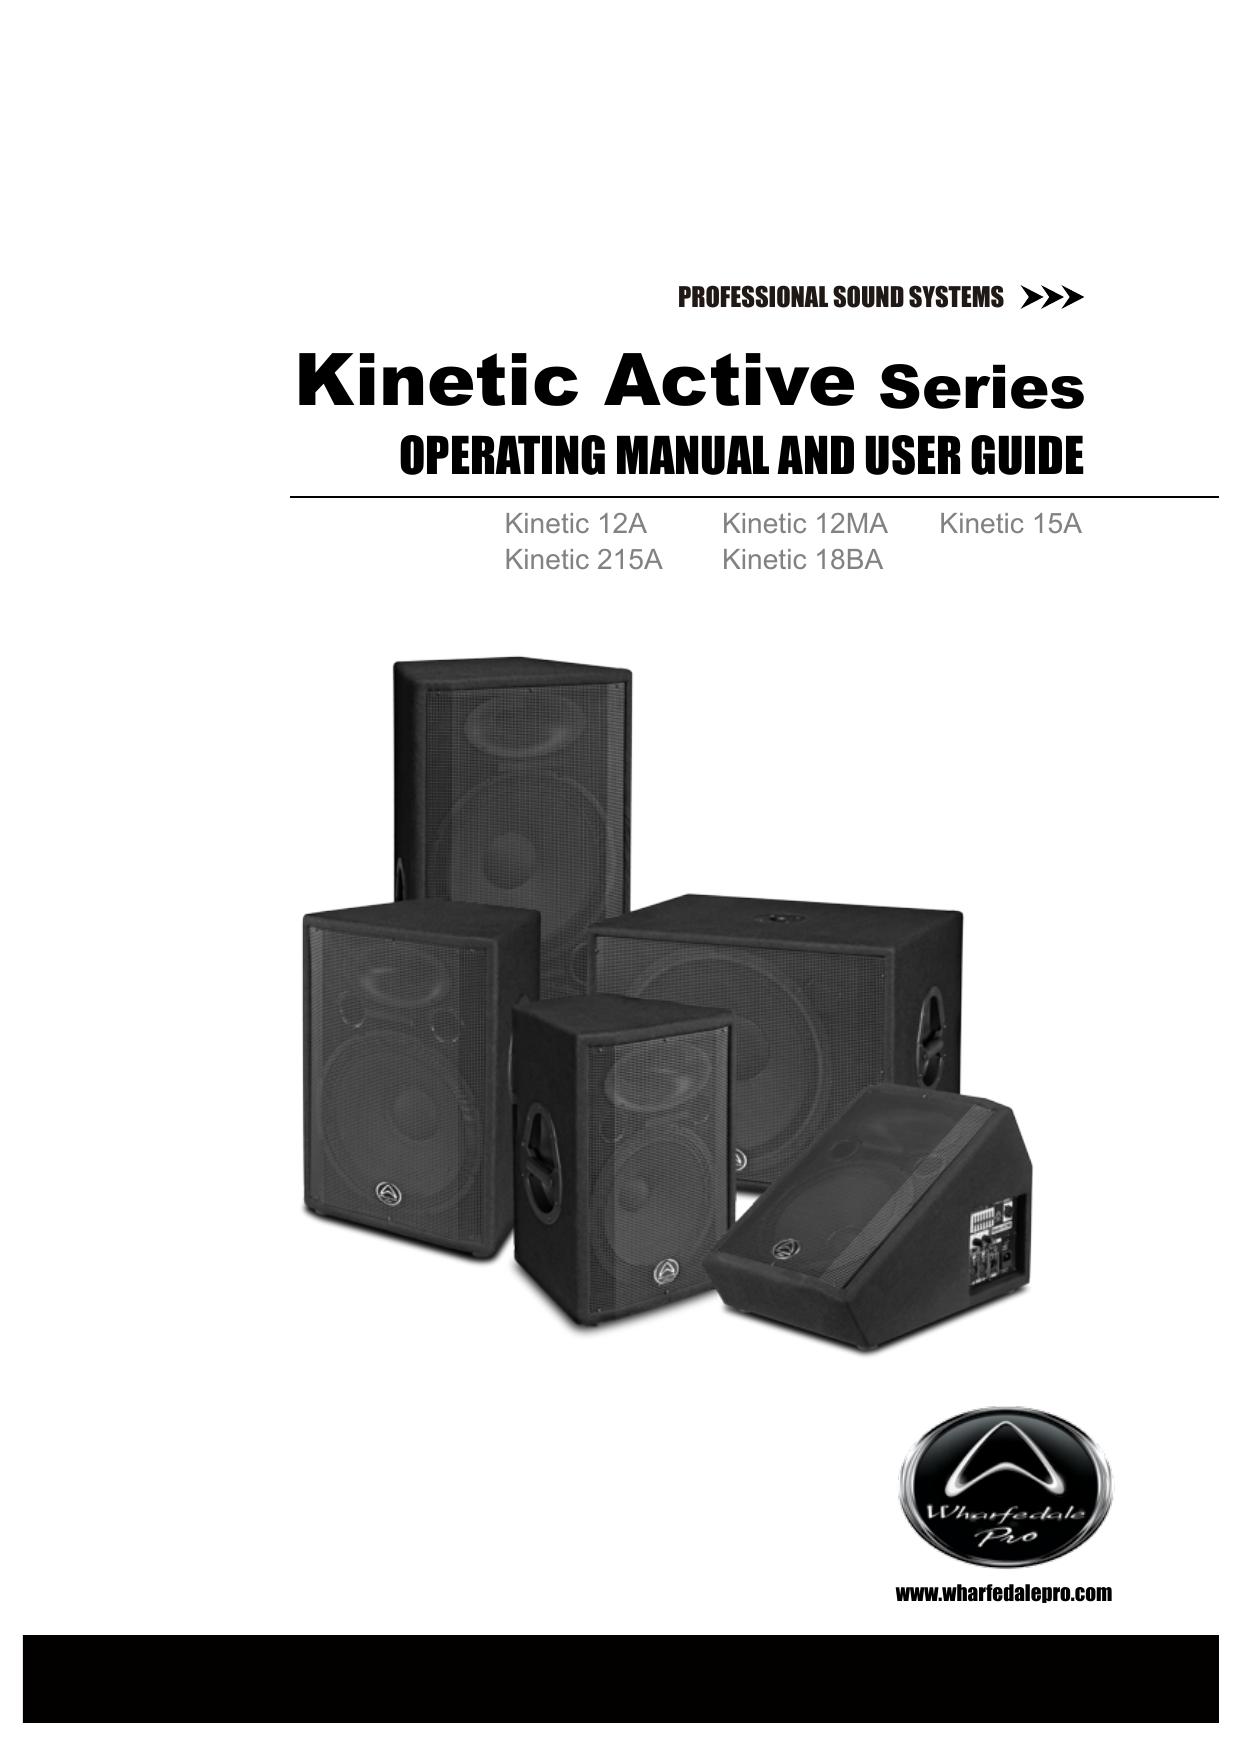 wharfedale pro kinetic 18ba user guide manualzz com rh manualzz com